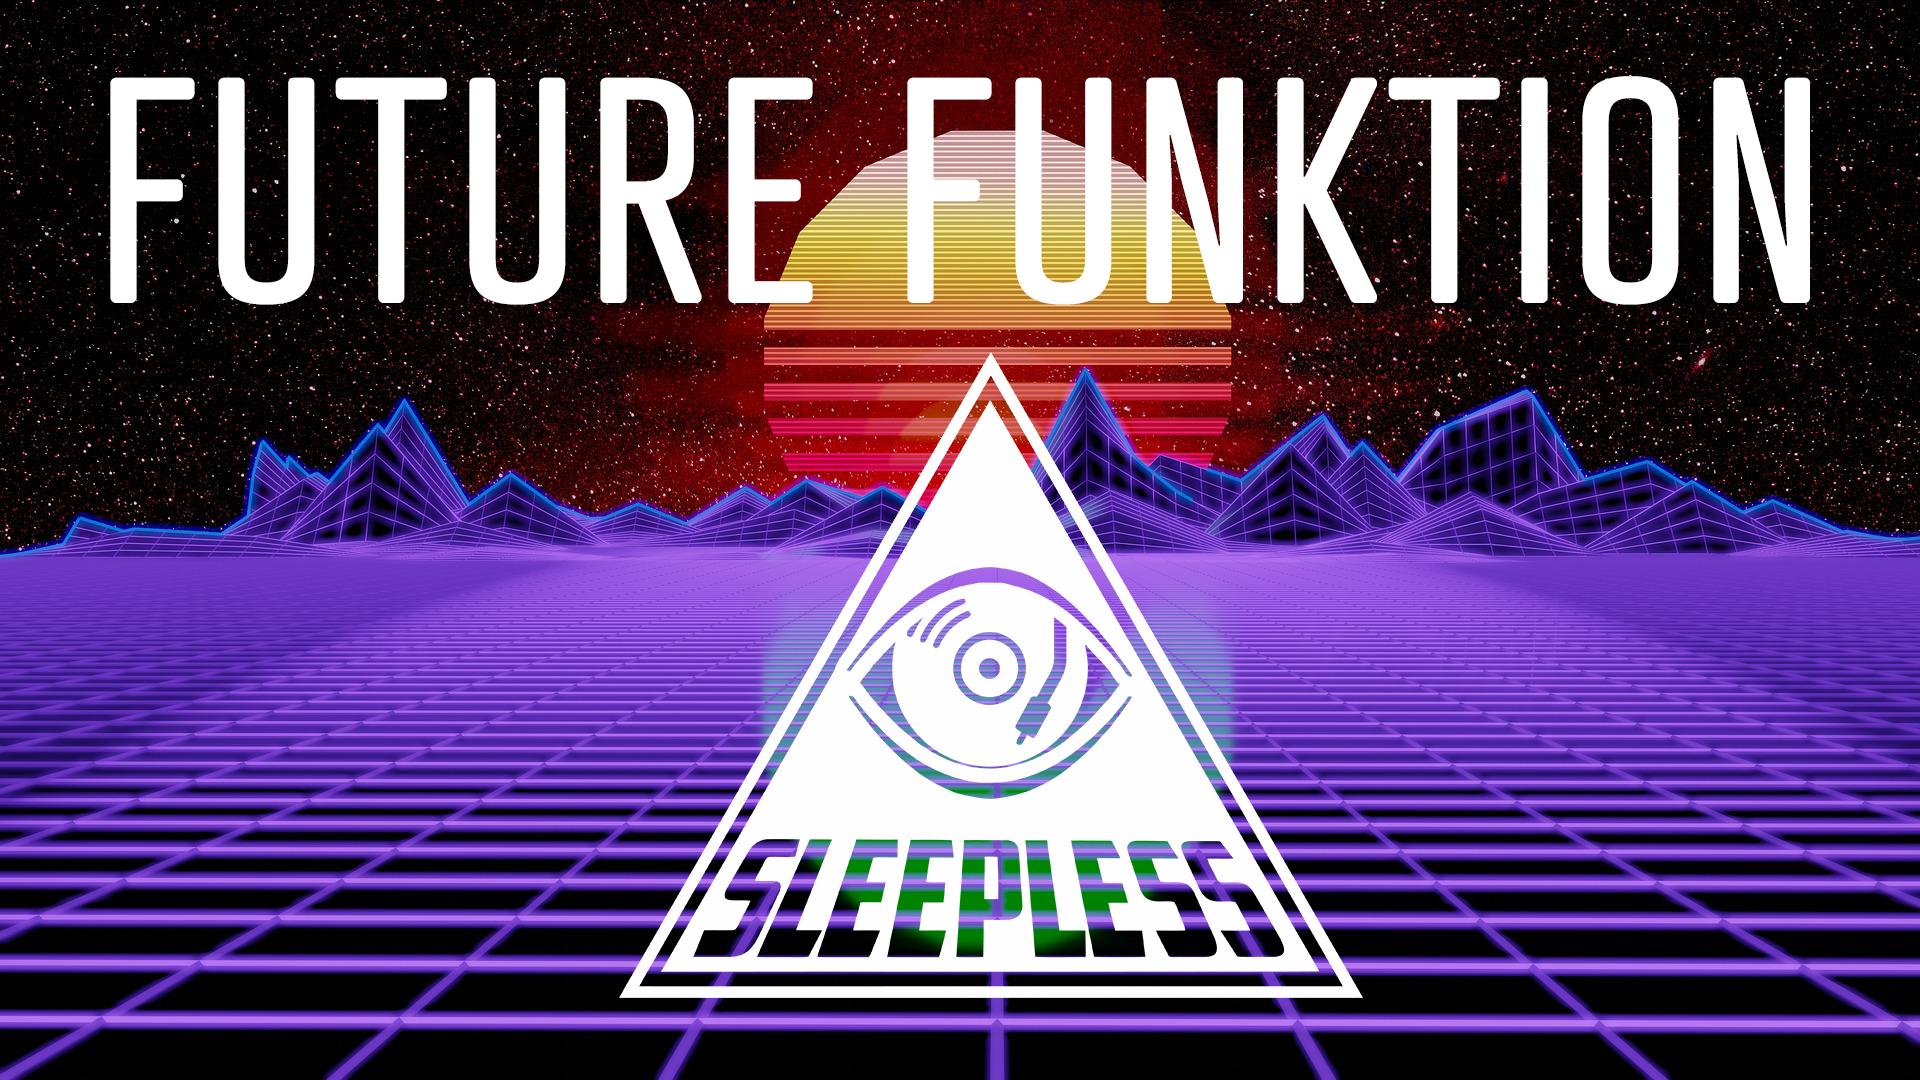 future funktion eventbrite.png